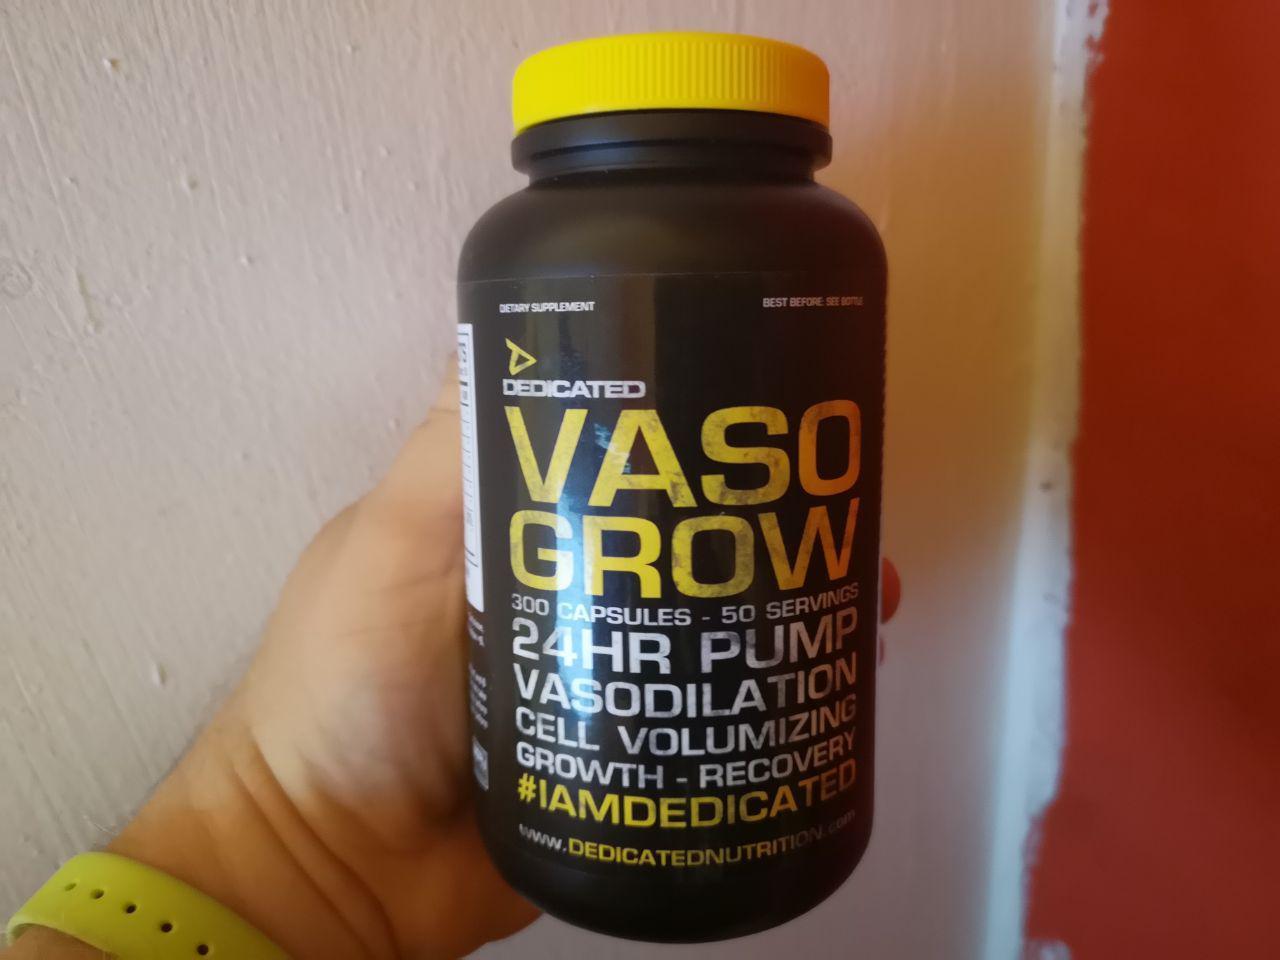 Dedicated Nutrition Vaso Grow im Test